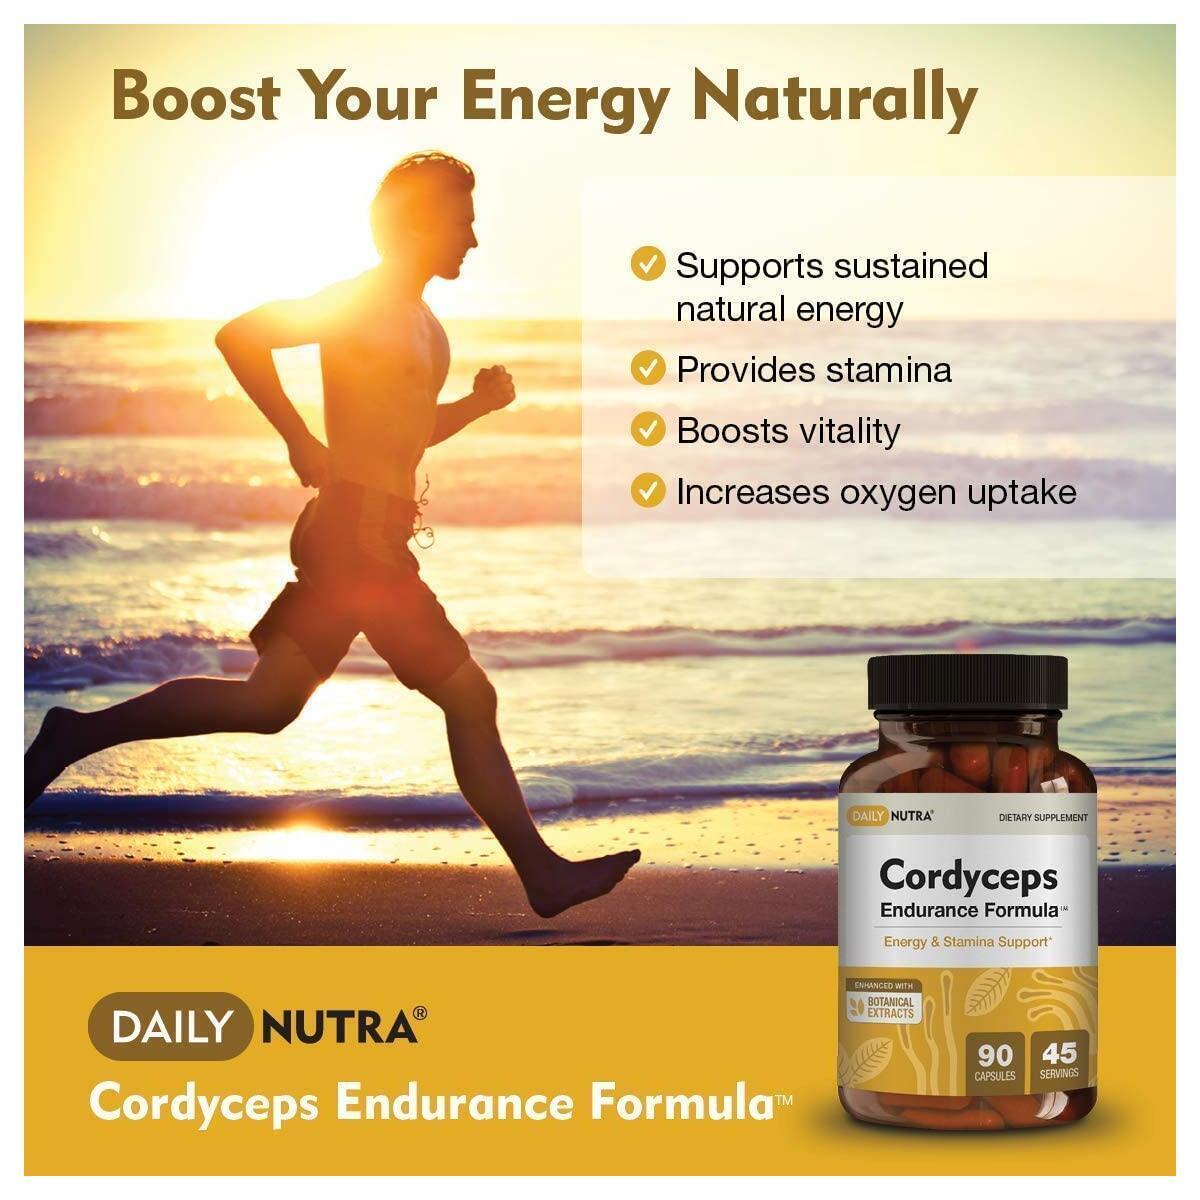 Cordyceps Endurance Formula by DailyNutra - Natural Energy Supplement - Caffeine Free | Organic Mushroom Extract with KSM-66 Ashwagandha, Eleuthero and Rhodiola